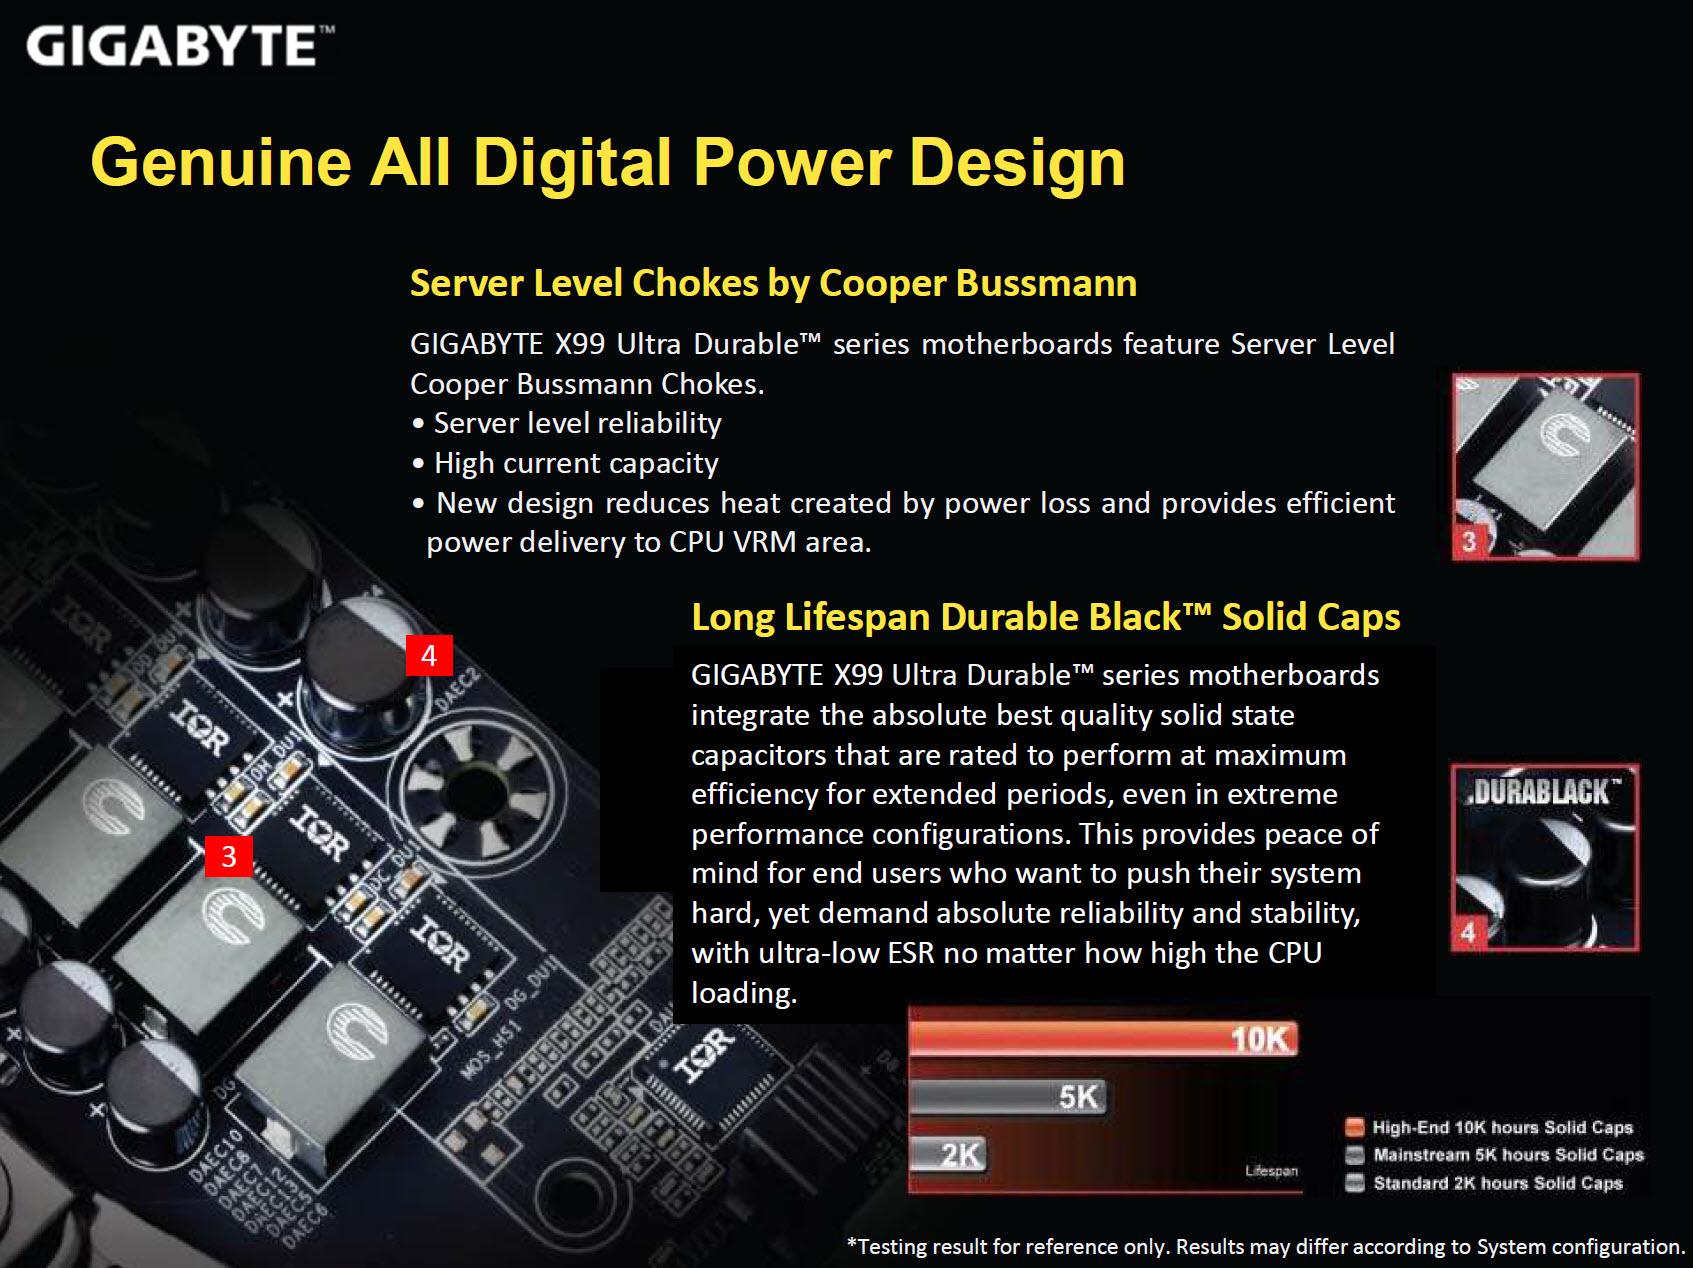 gigabyte-x99-ud7-wifi_all-digital-power